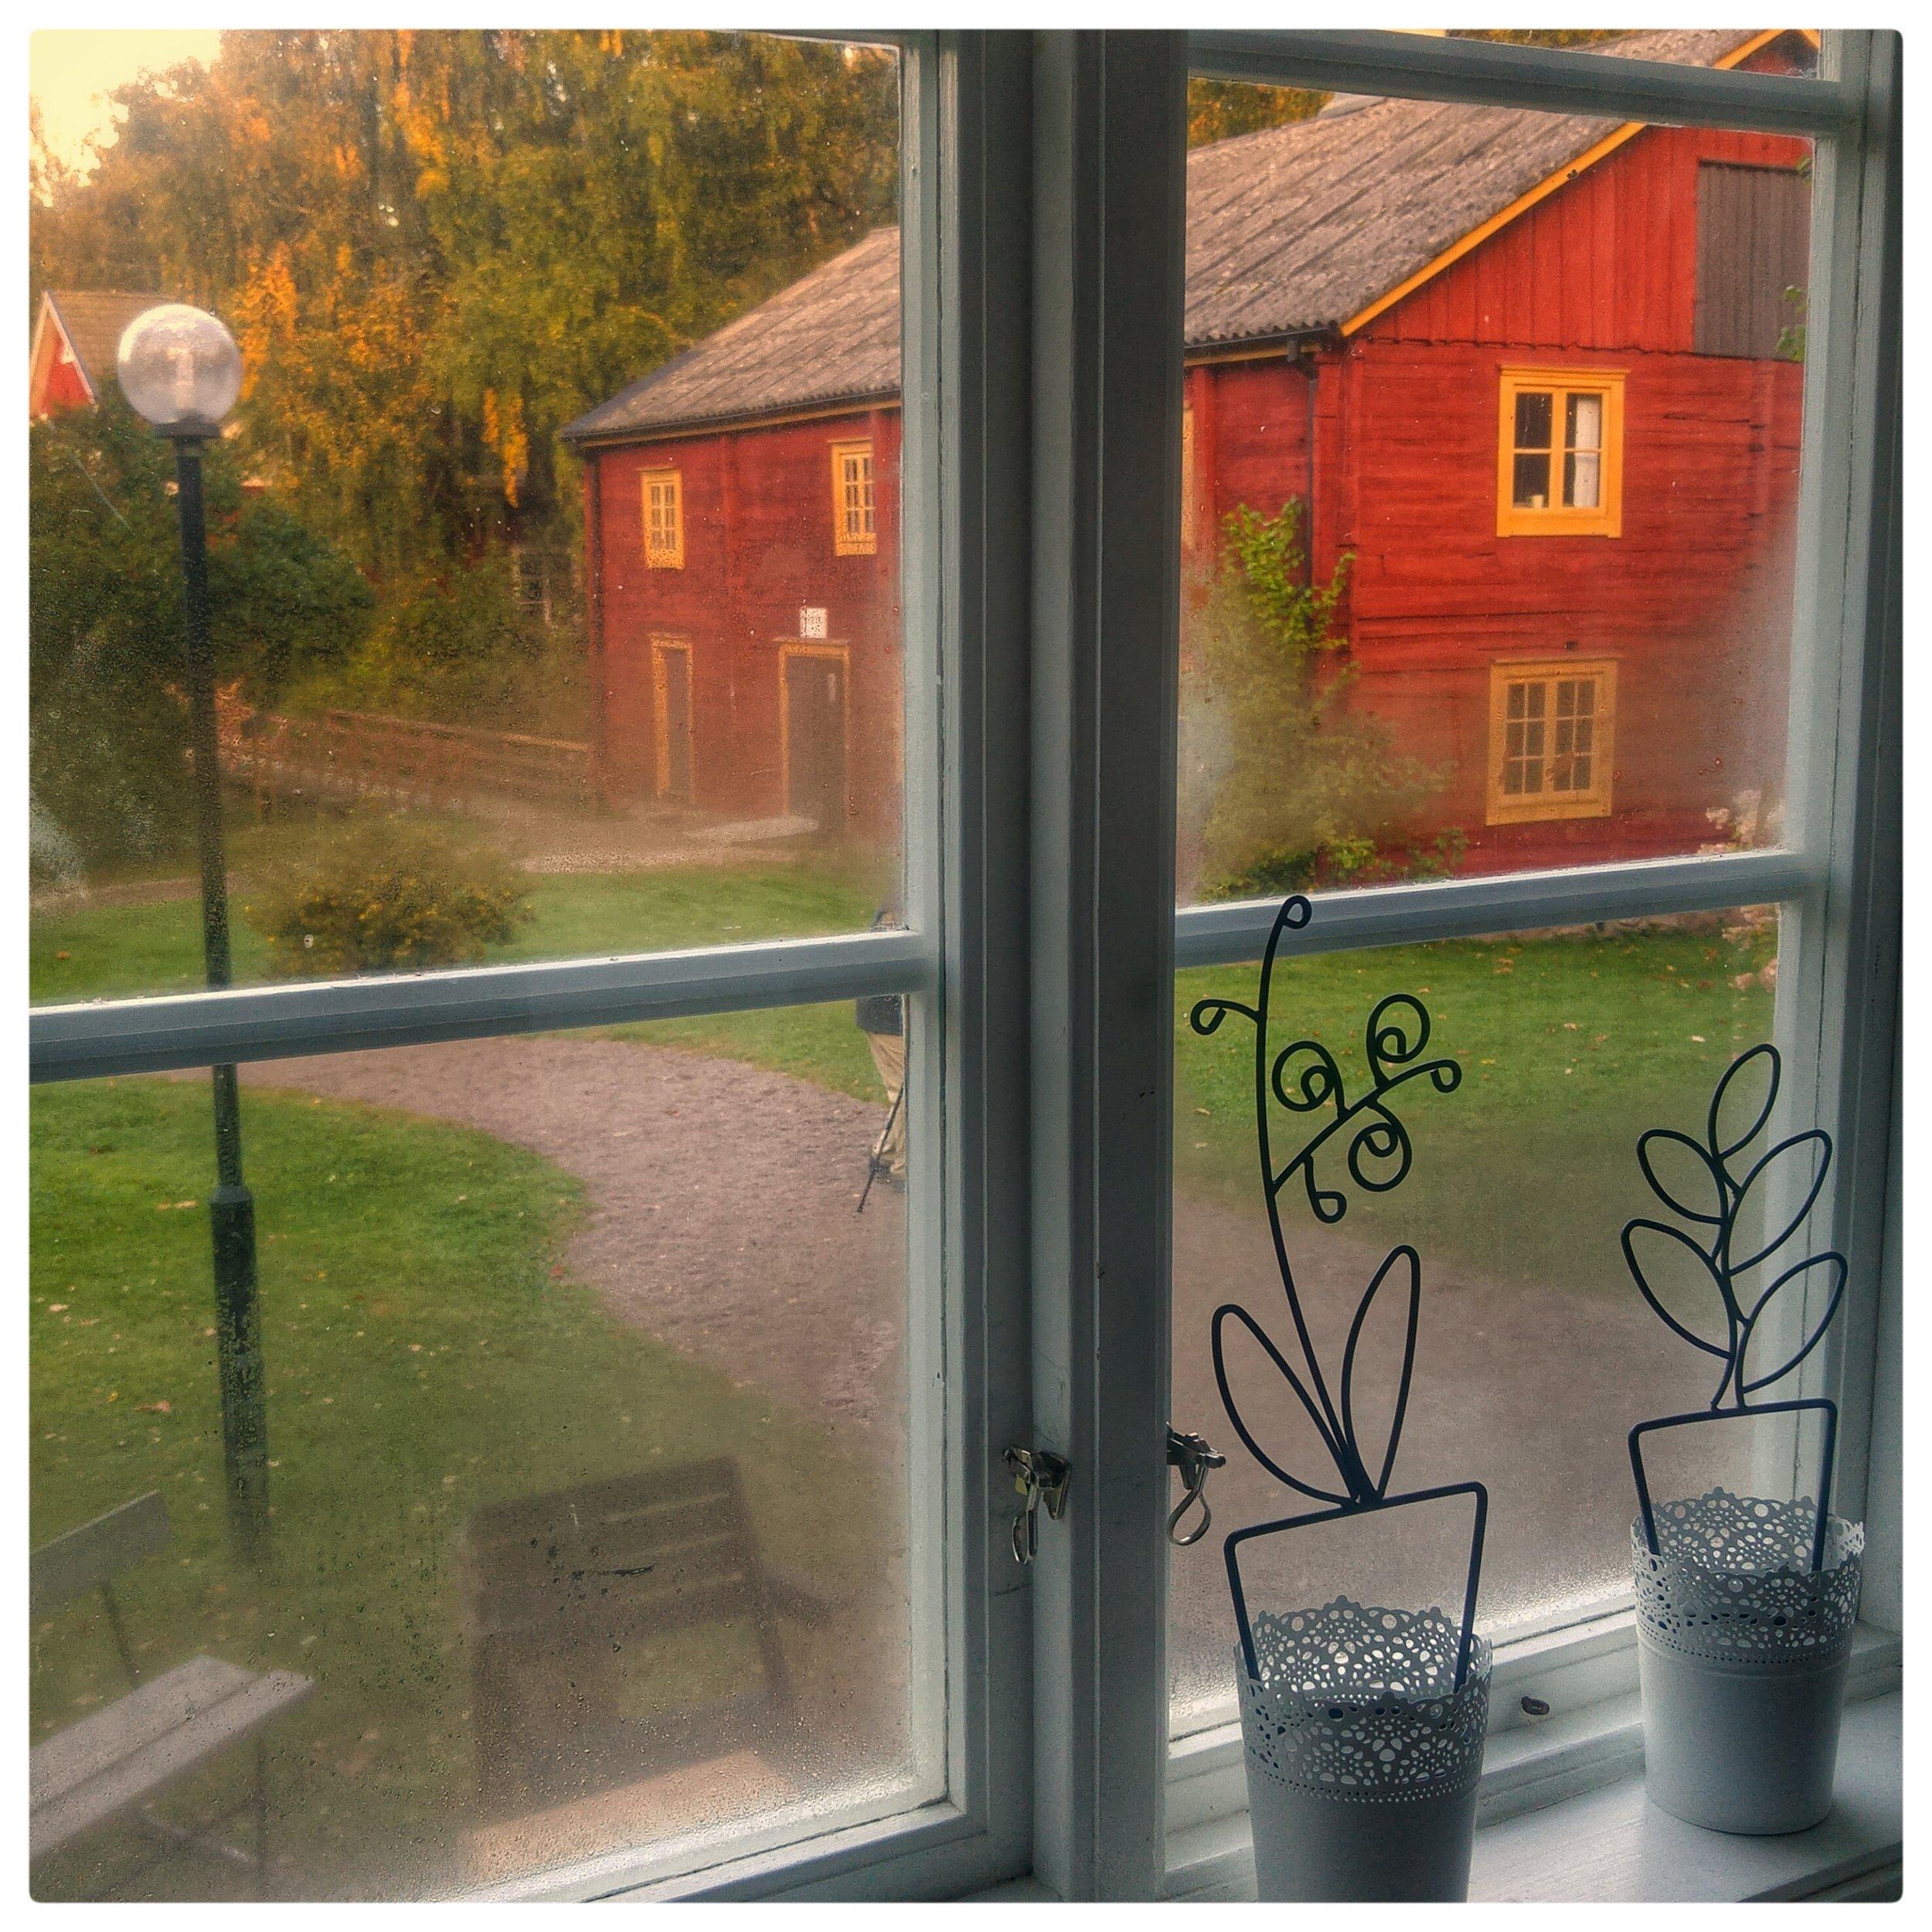 September 18 -Day 262: Morning away from home